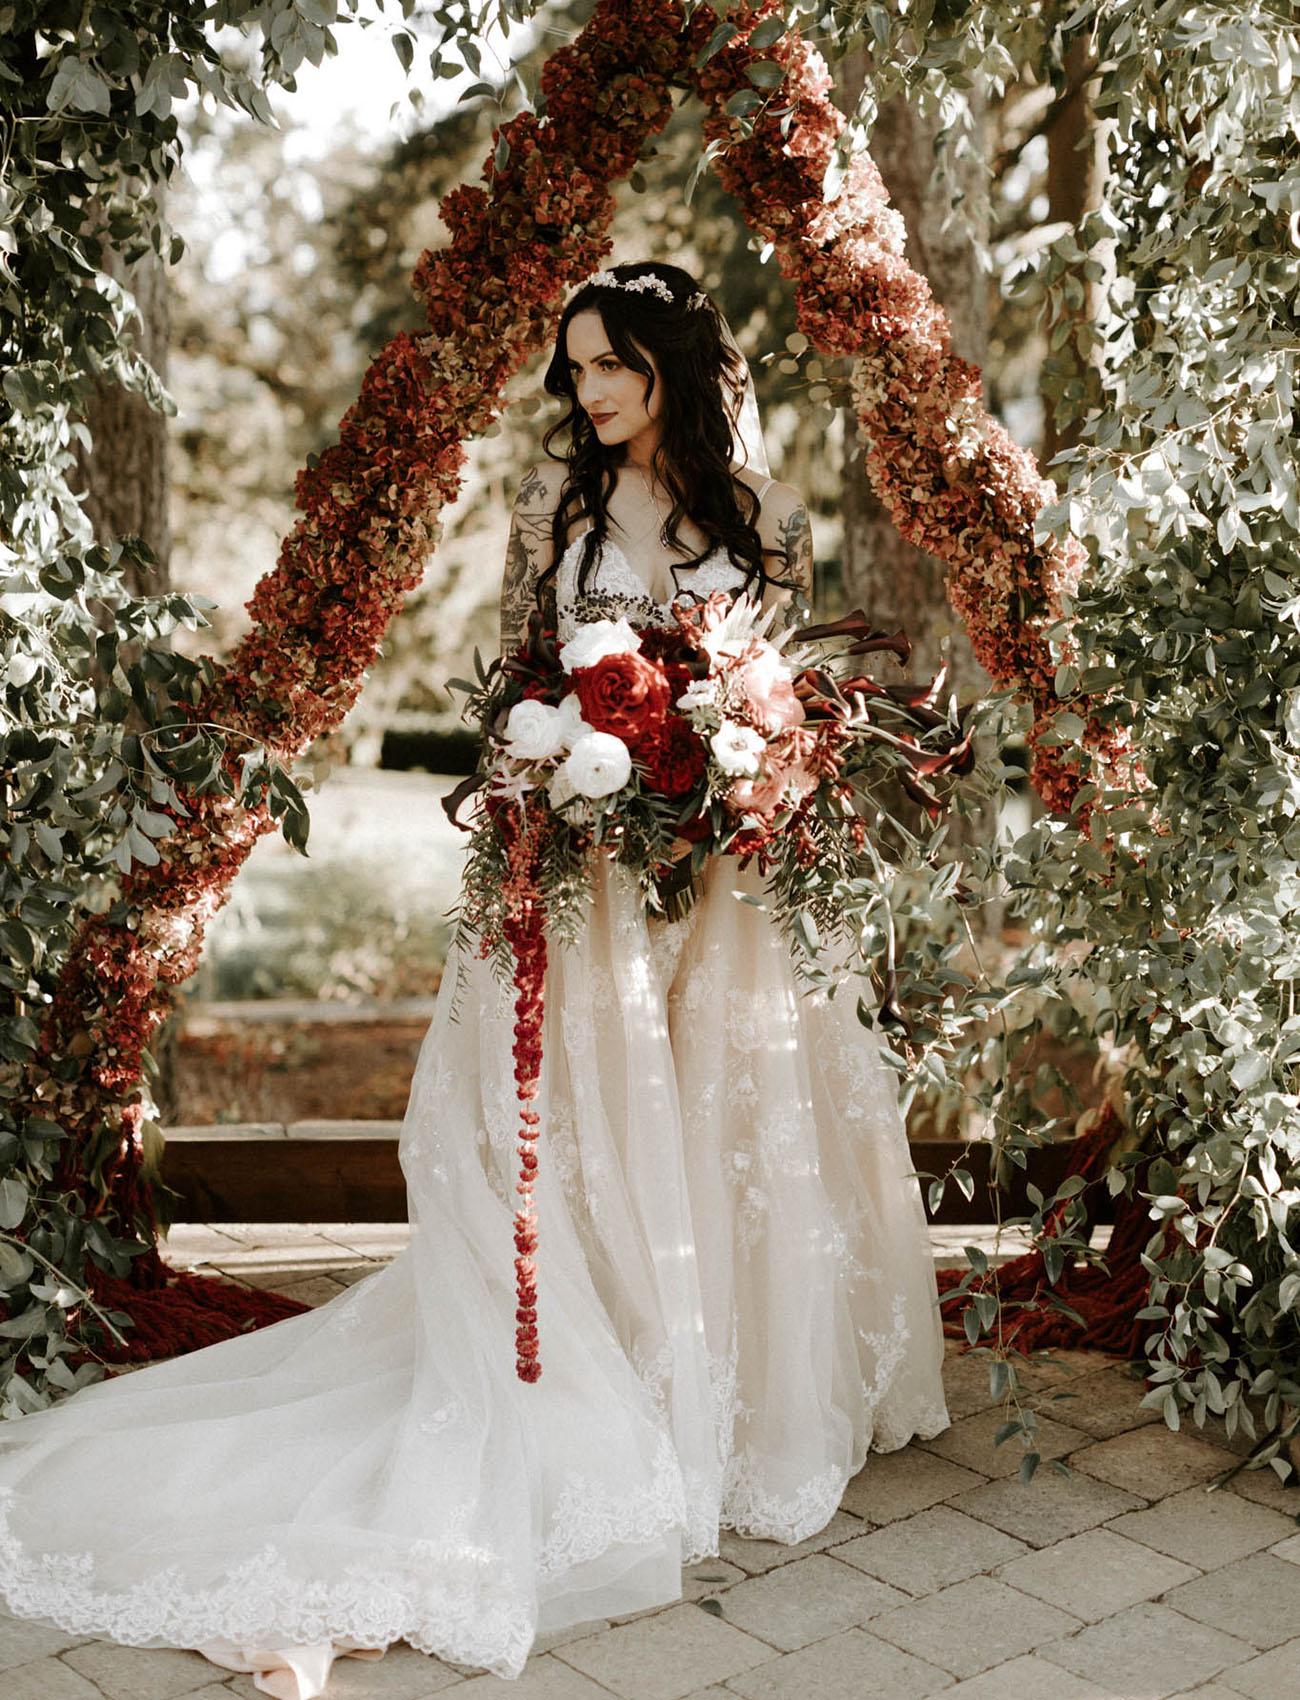 Jaclyns Bridal Wedding Dress